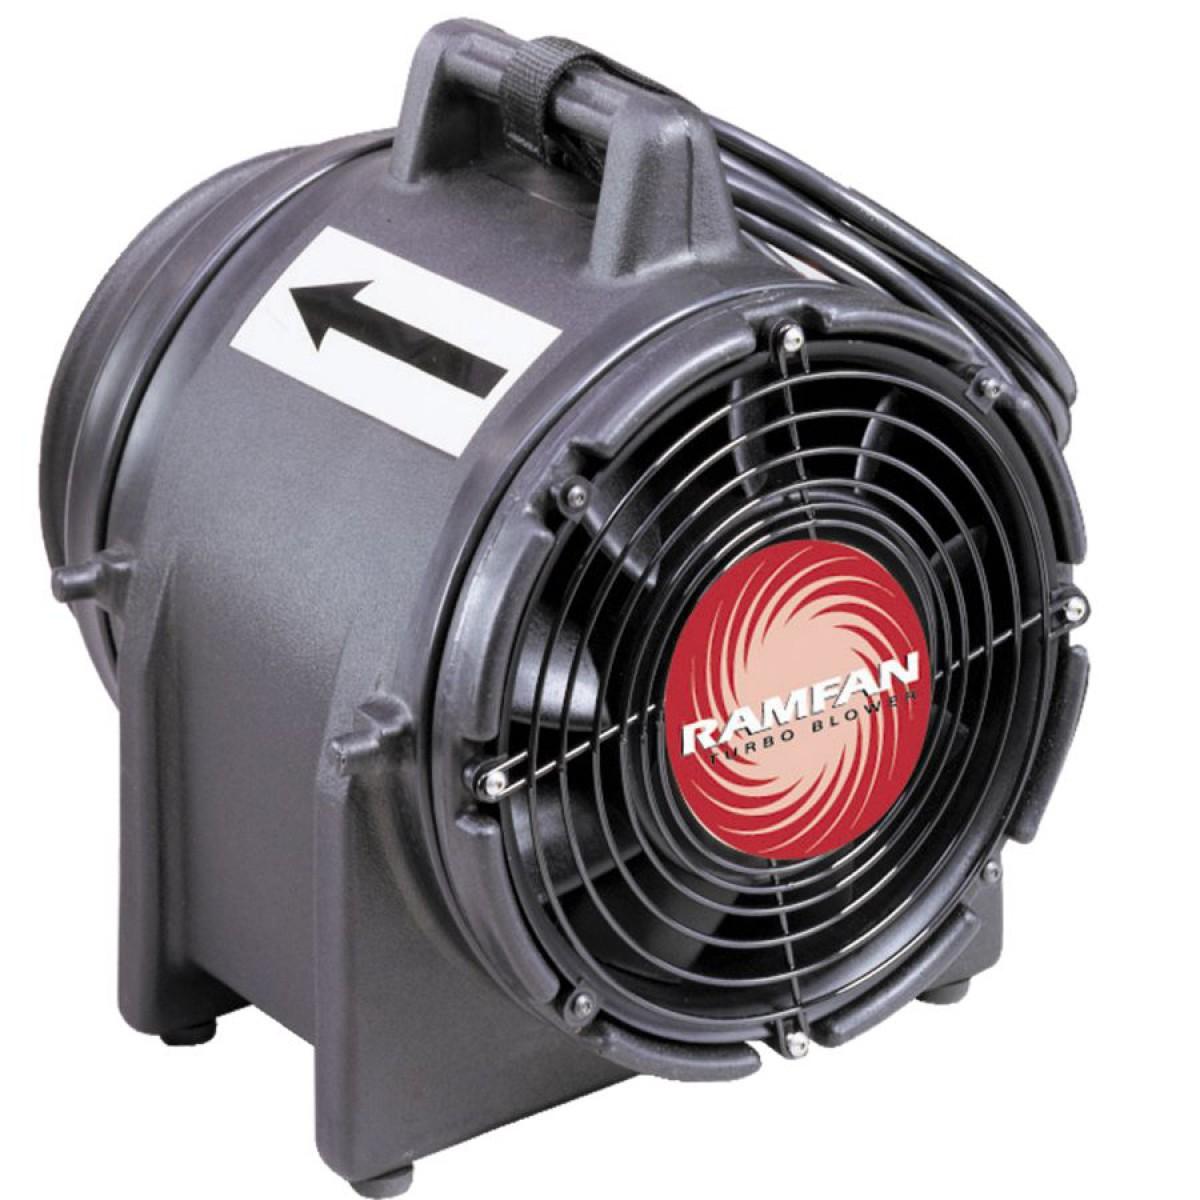 ventilateur extracteur portable atex 20 cm. Black Bedroom Furniture Sets. Home Design Ideas